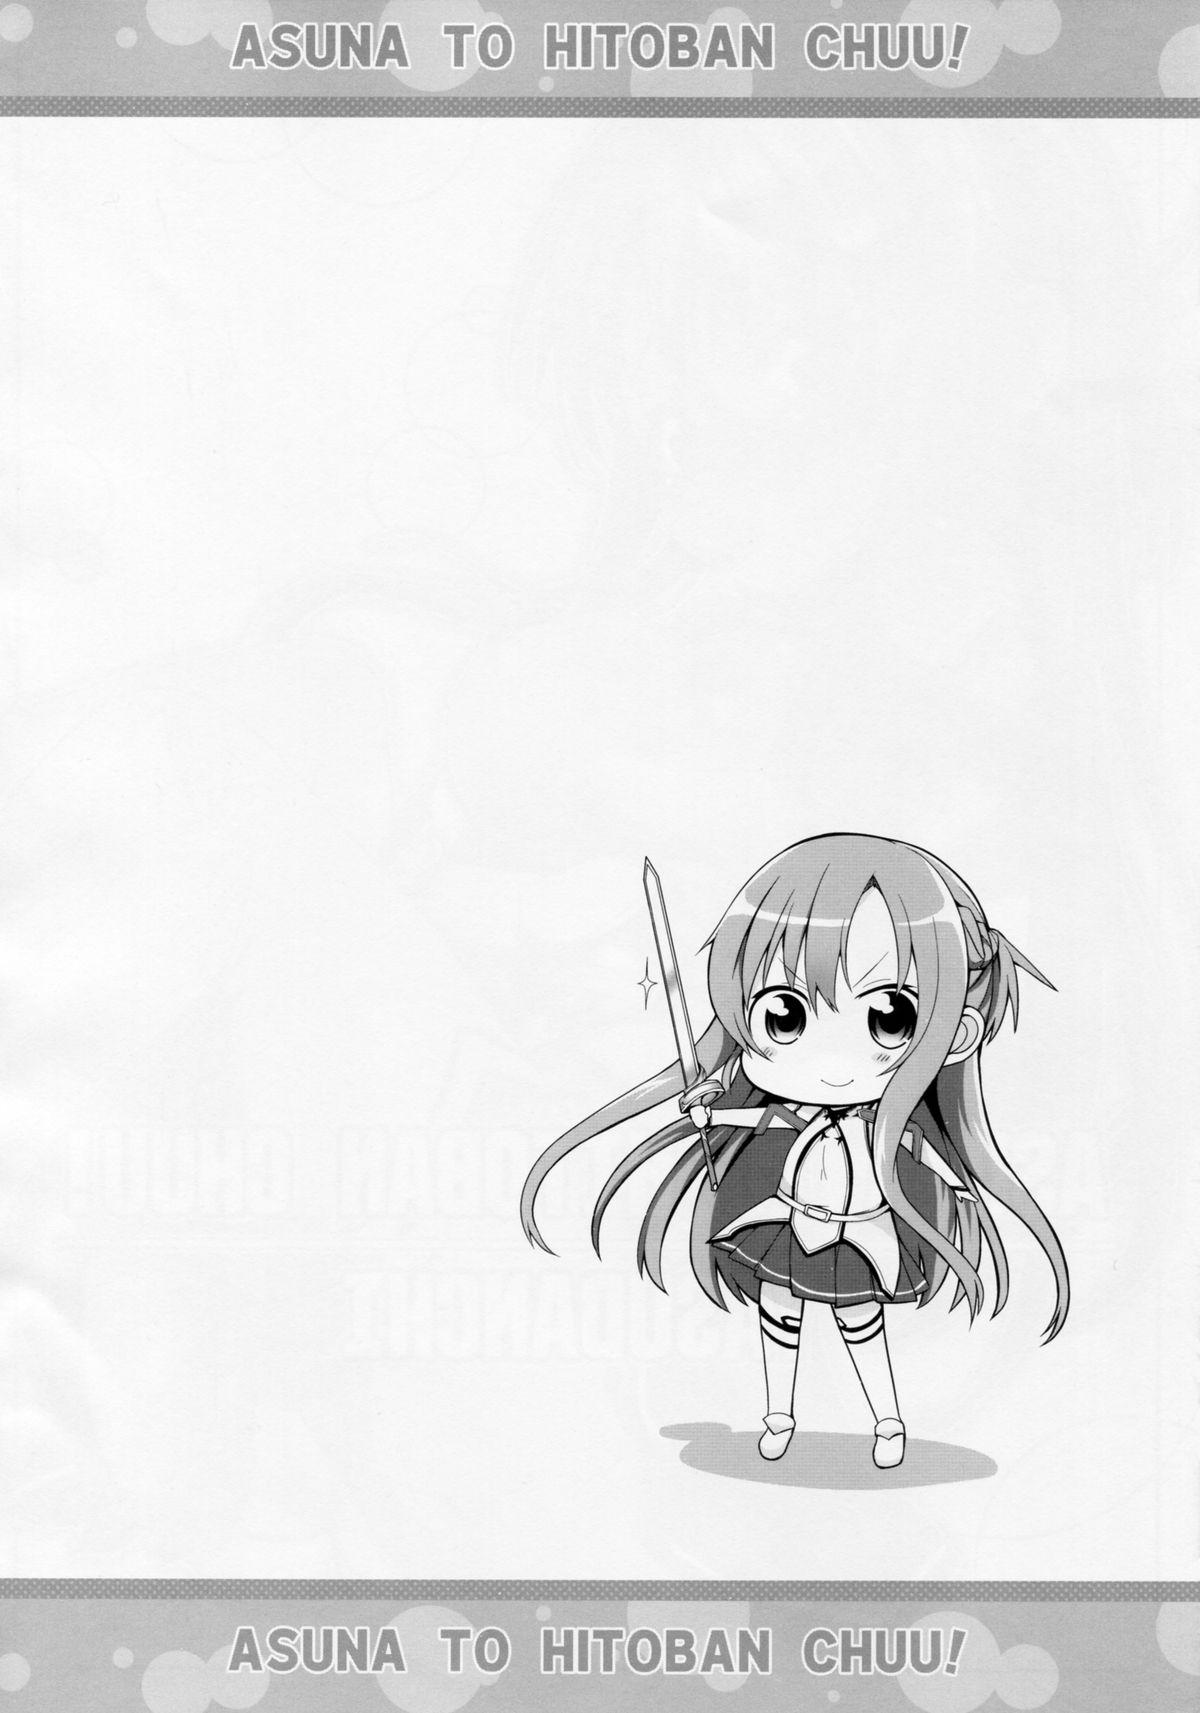 Asuna to Hitoban Chuu! 2